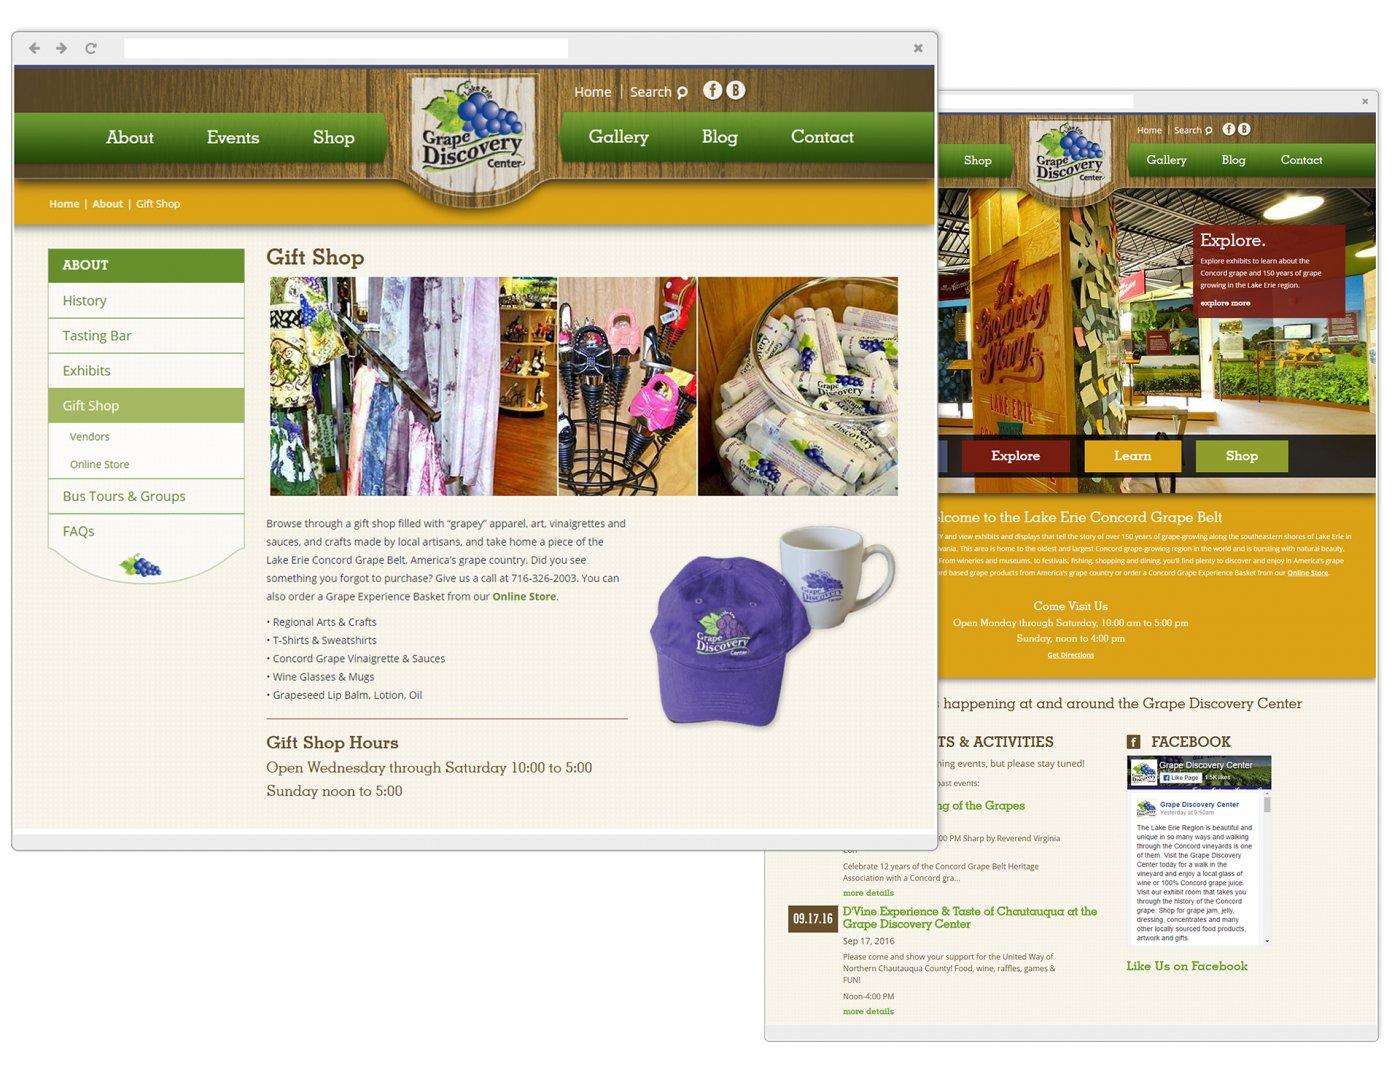 Grape Discovery Center Gift Shop